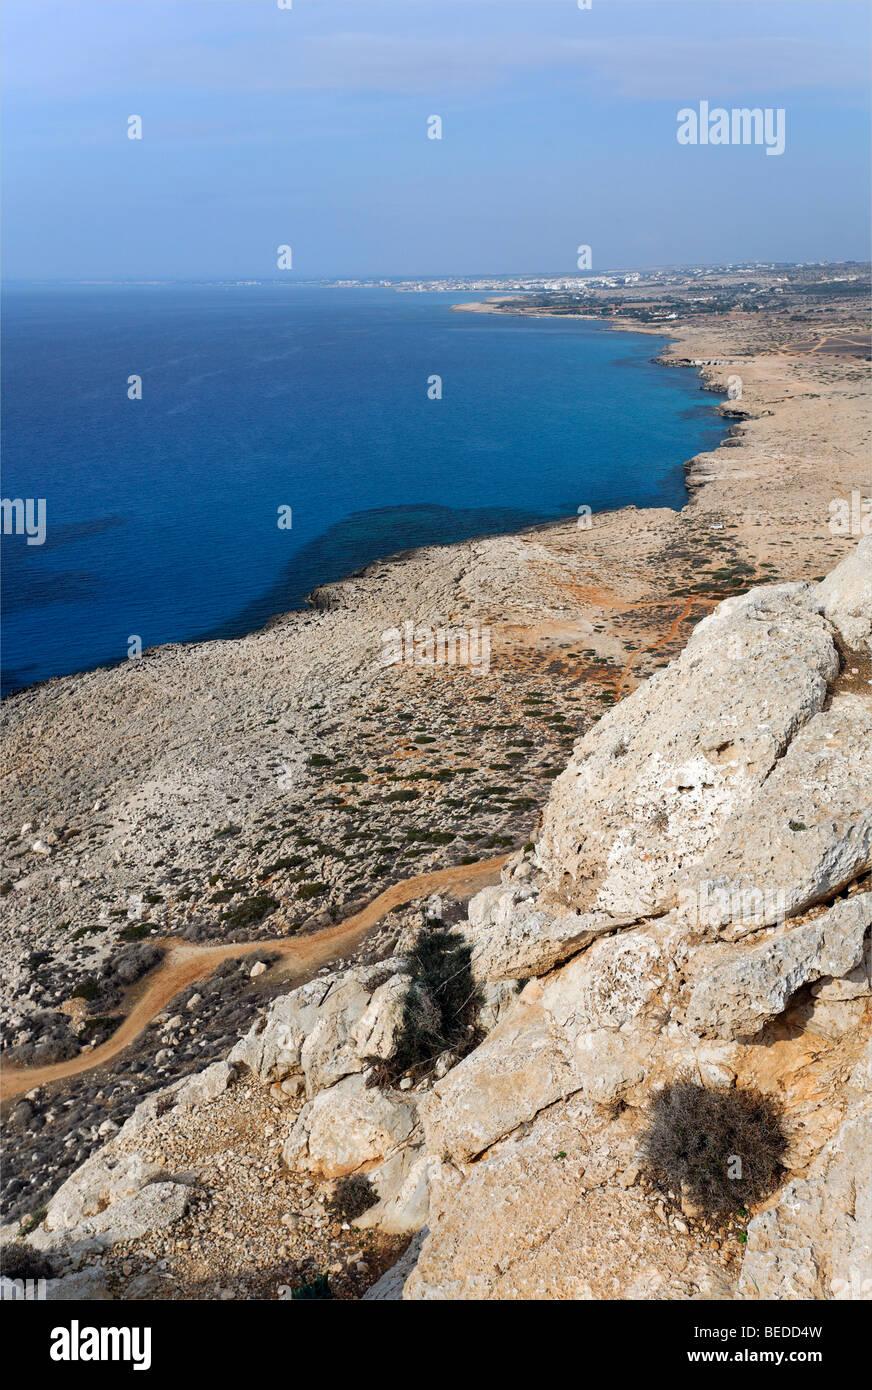 Cape Gkreko Peninsula, view of Agia Napa, Larnaca, Cyprus, Mediterranian Sea, Asia - Stock Image